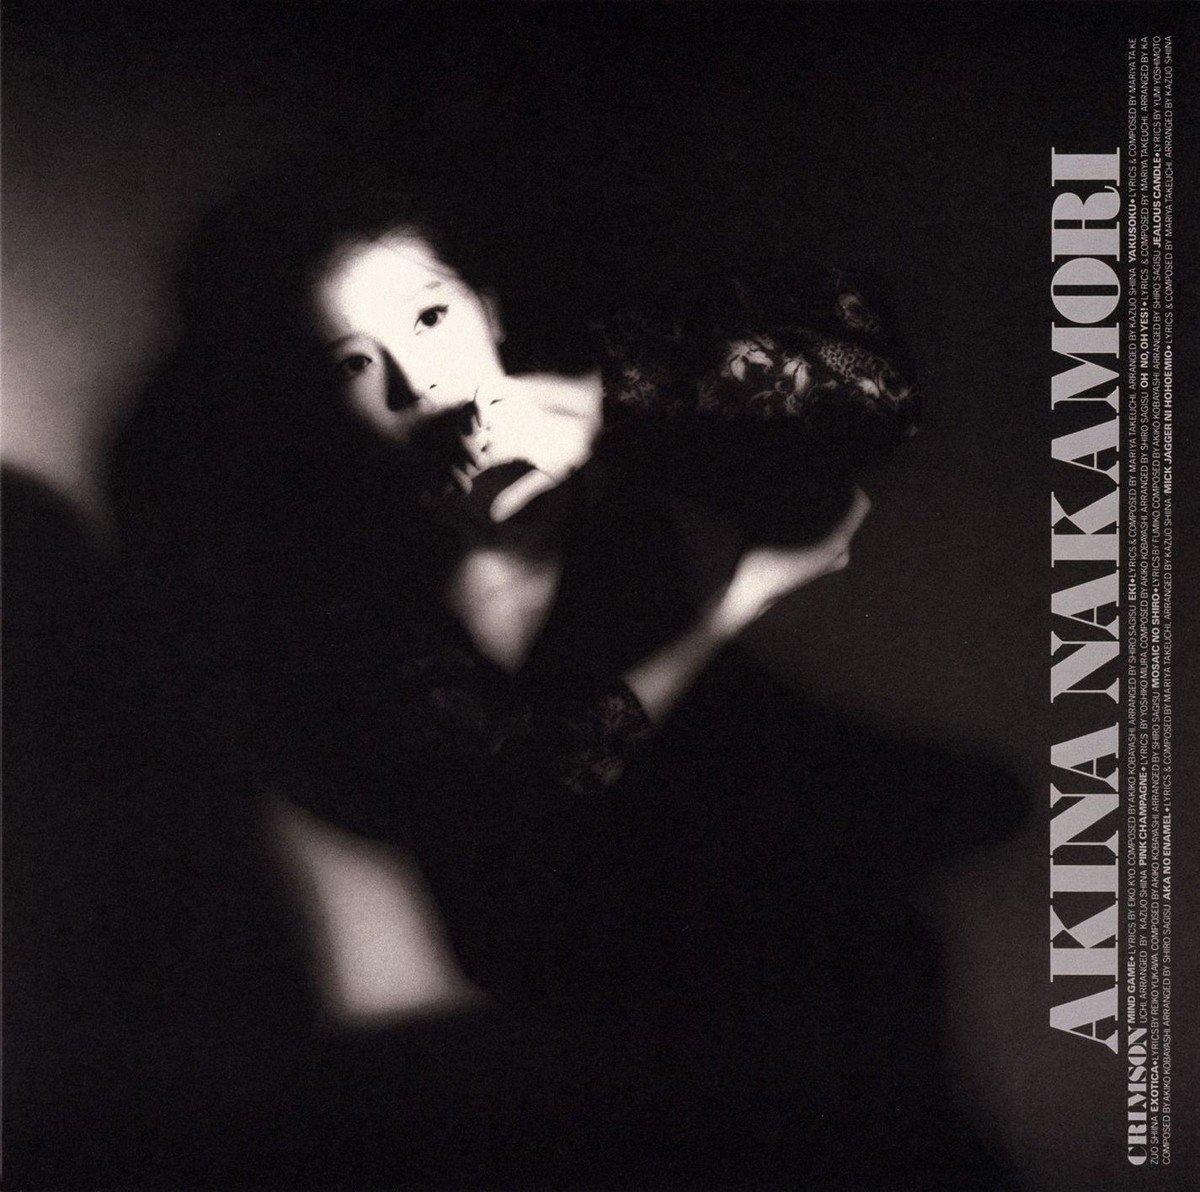 中森明菜 (Akina Nakamori) – Crimson [FLAC / 24bit Lossless / WEB] [1986.12.24]